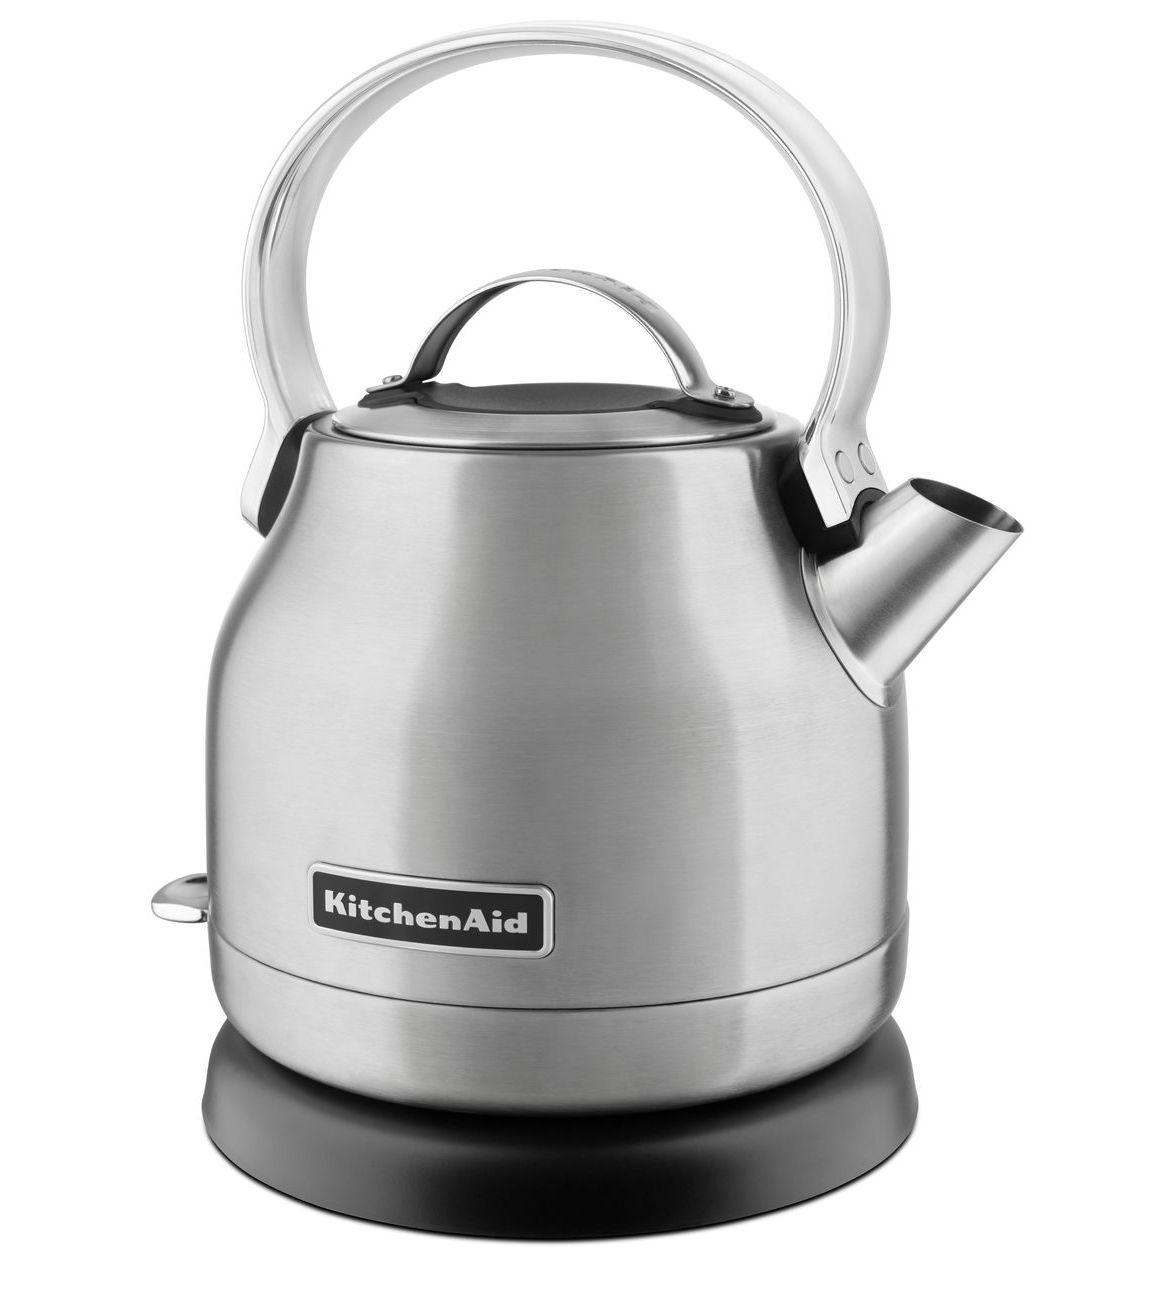 Kitchenaid 125l electric kettle 9999 colors available